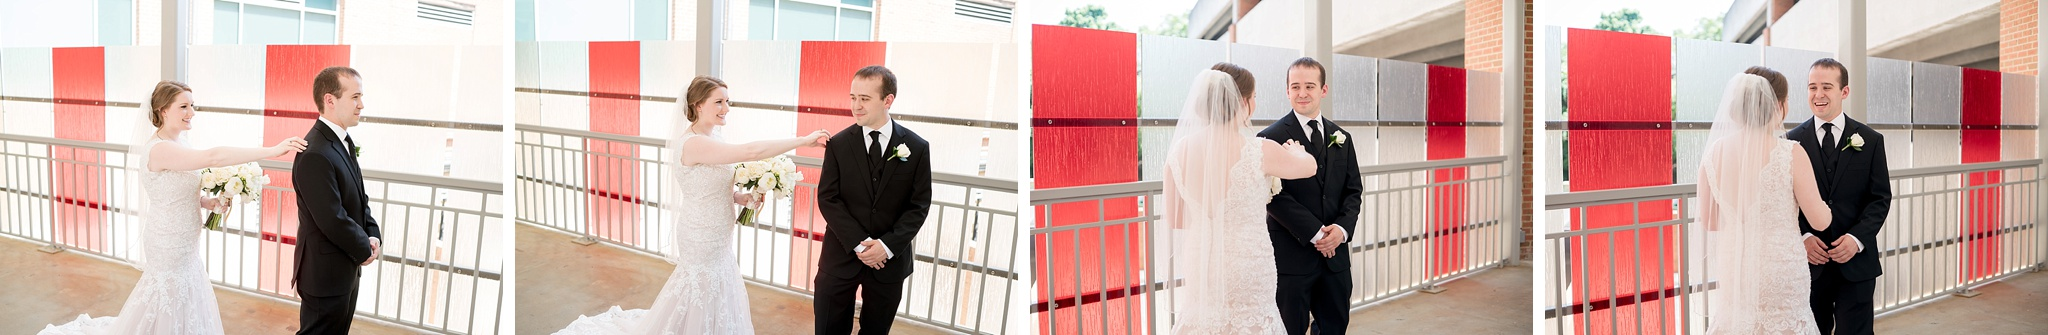 Pavilion-Carriage-Farms-Wedding-Photographer-178.jpg